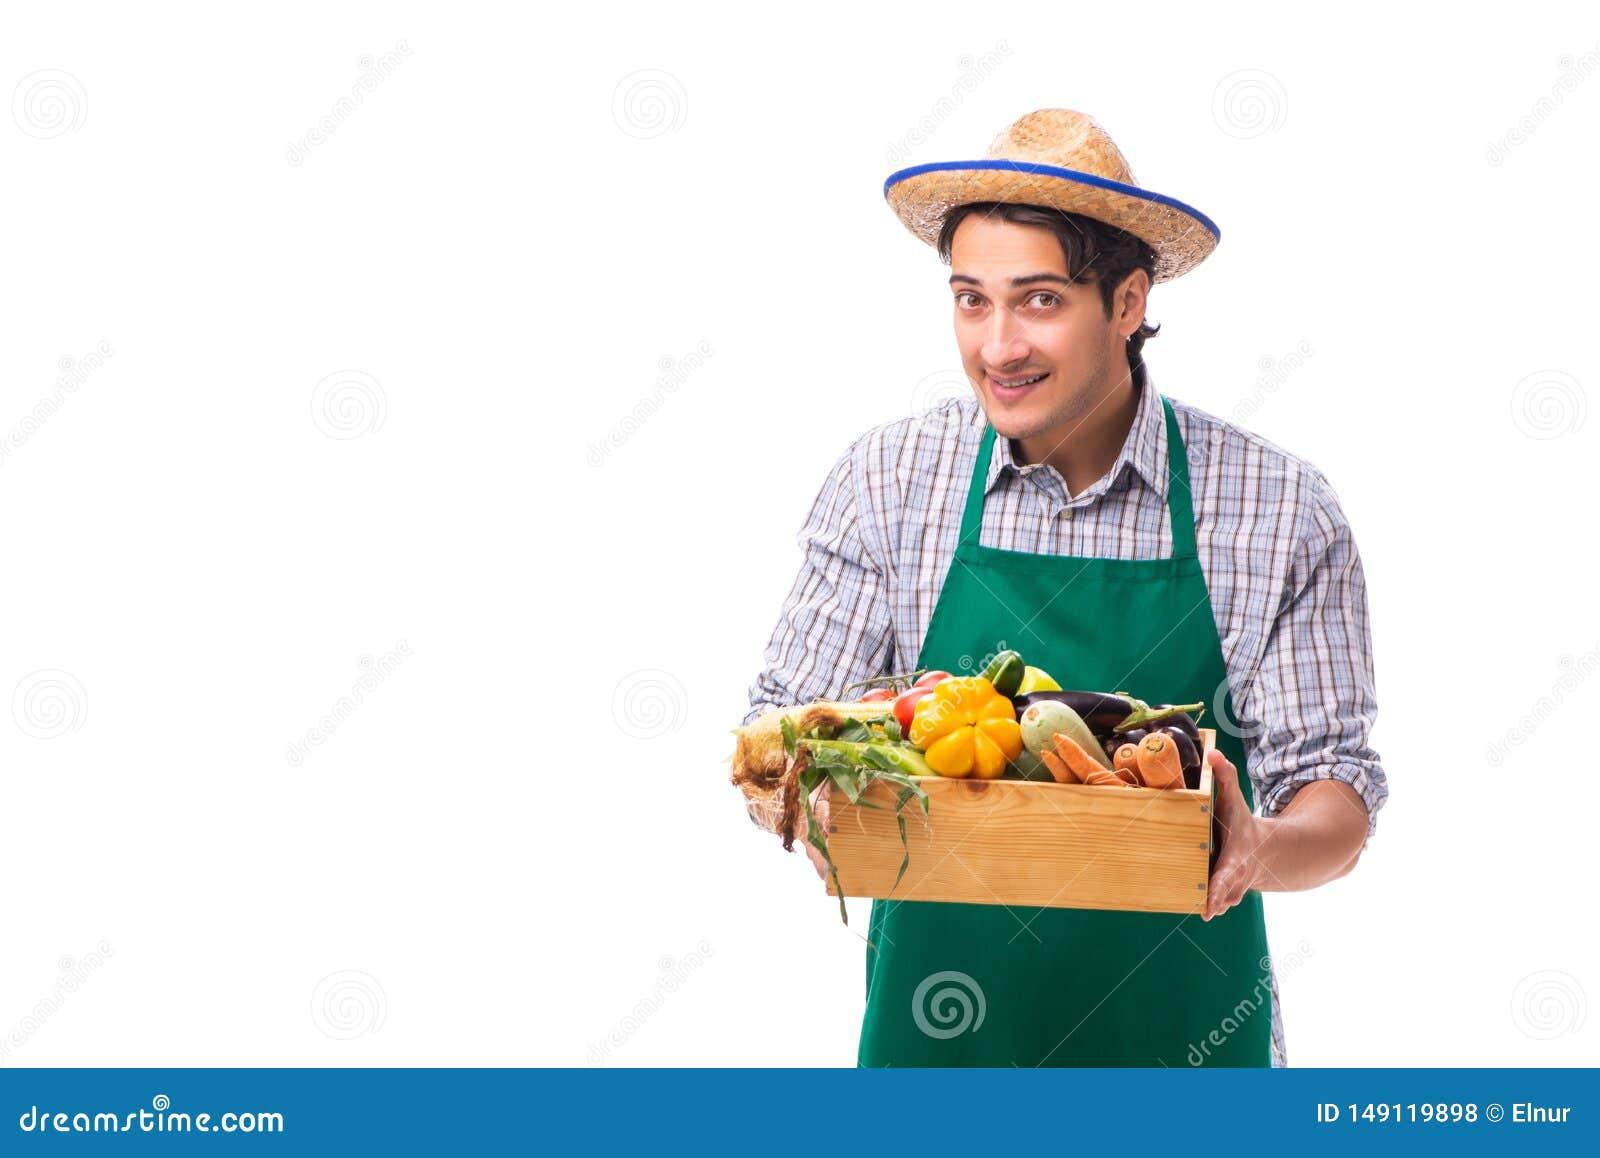 Den unga bonden med ny jordbruksprodukter som isoleras p? vit bakgrund